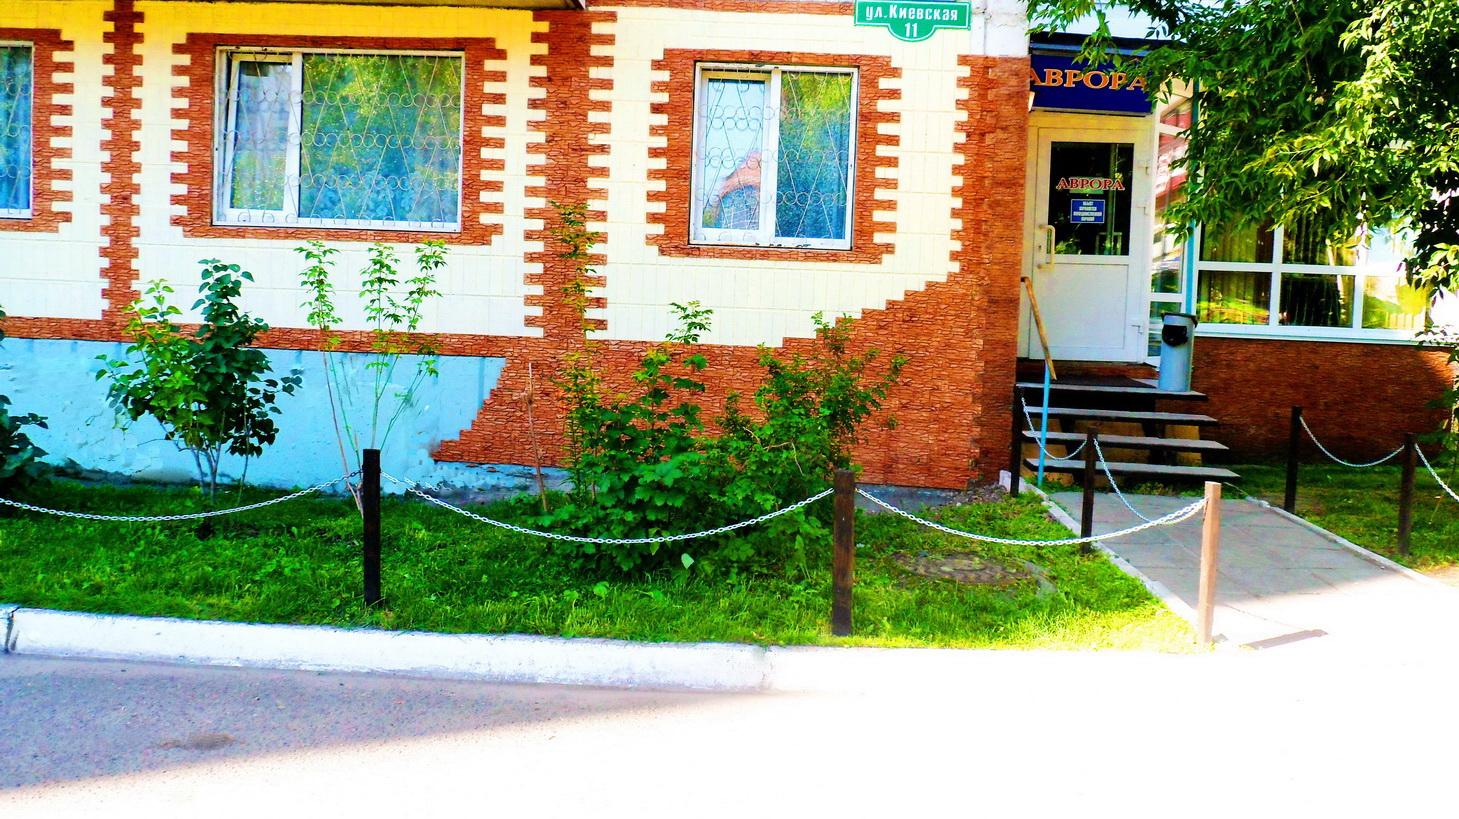 Гостиницы в квартирах томска